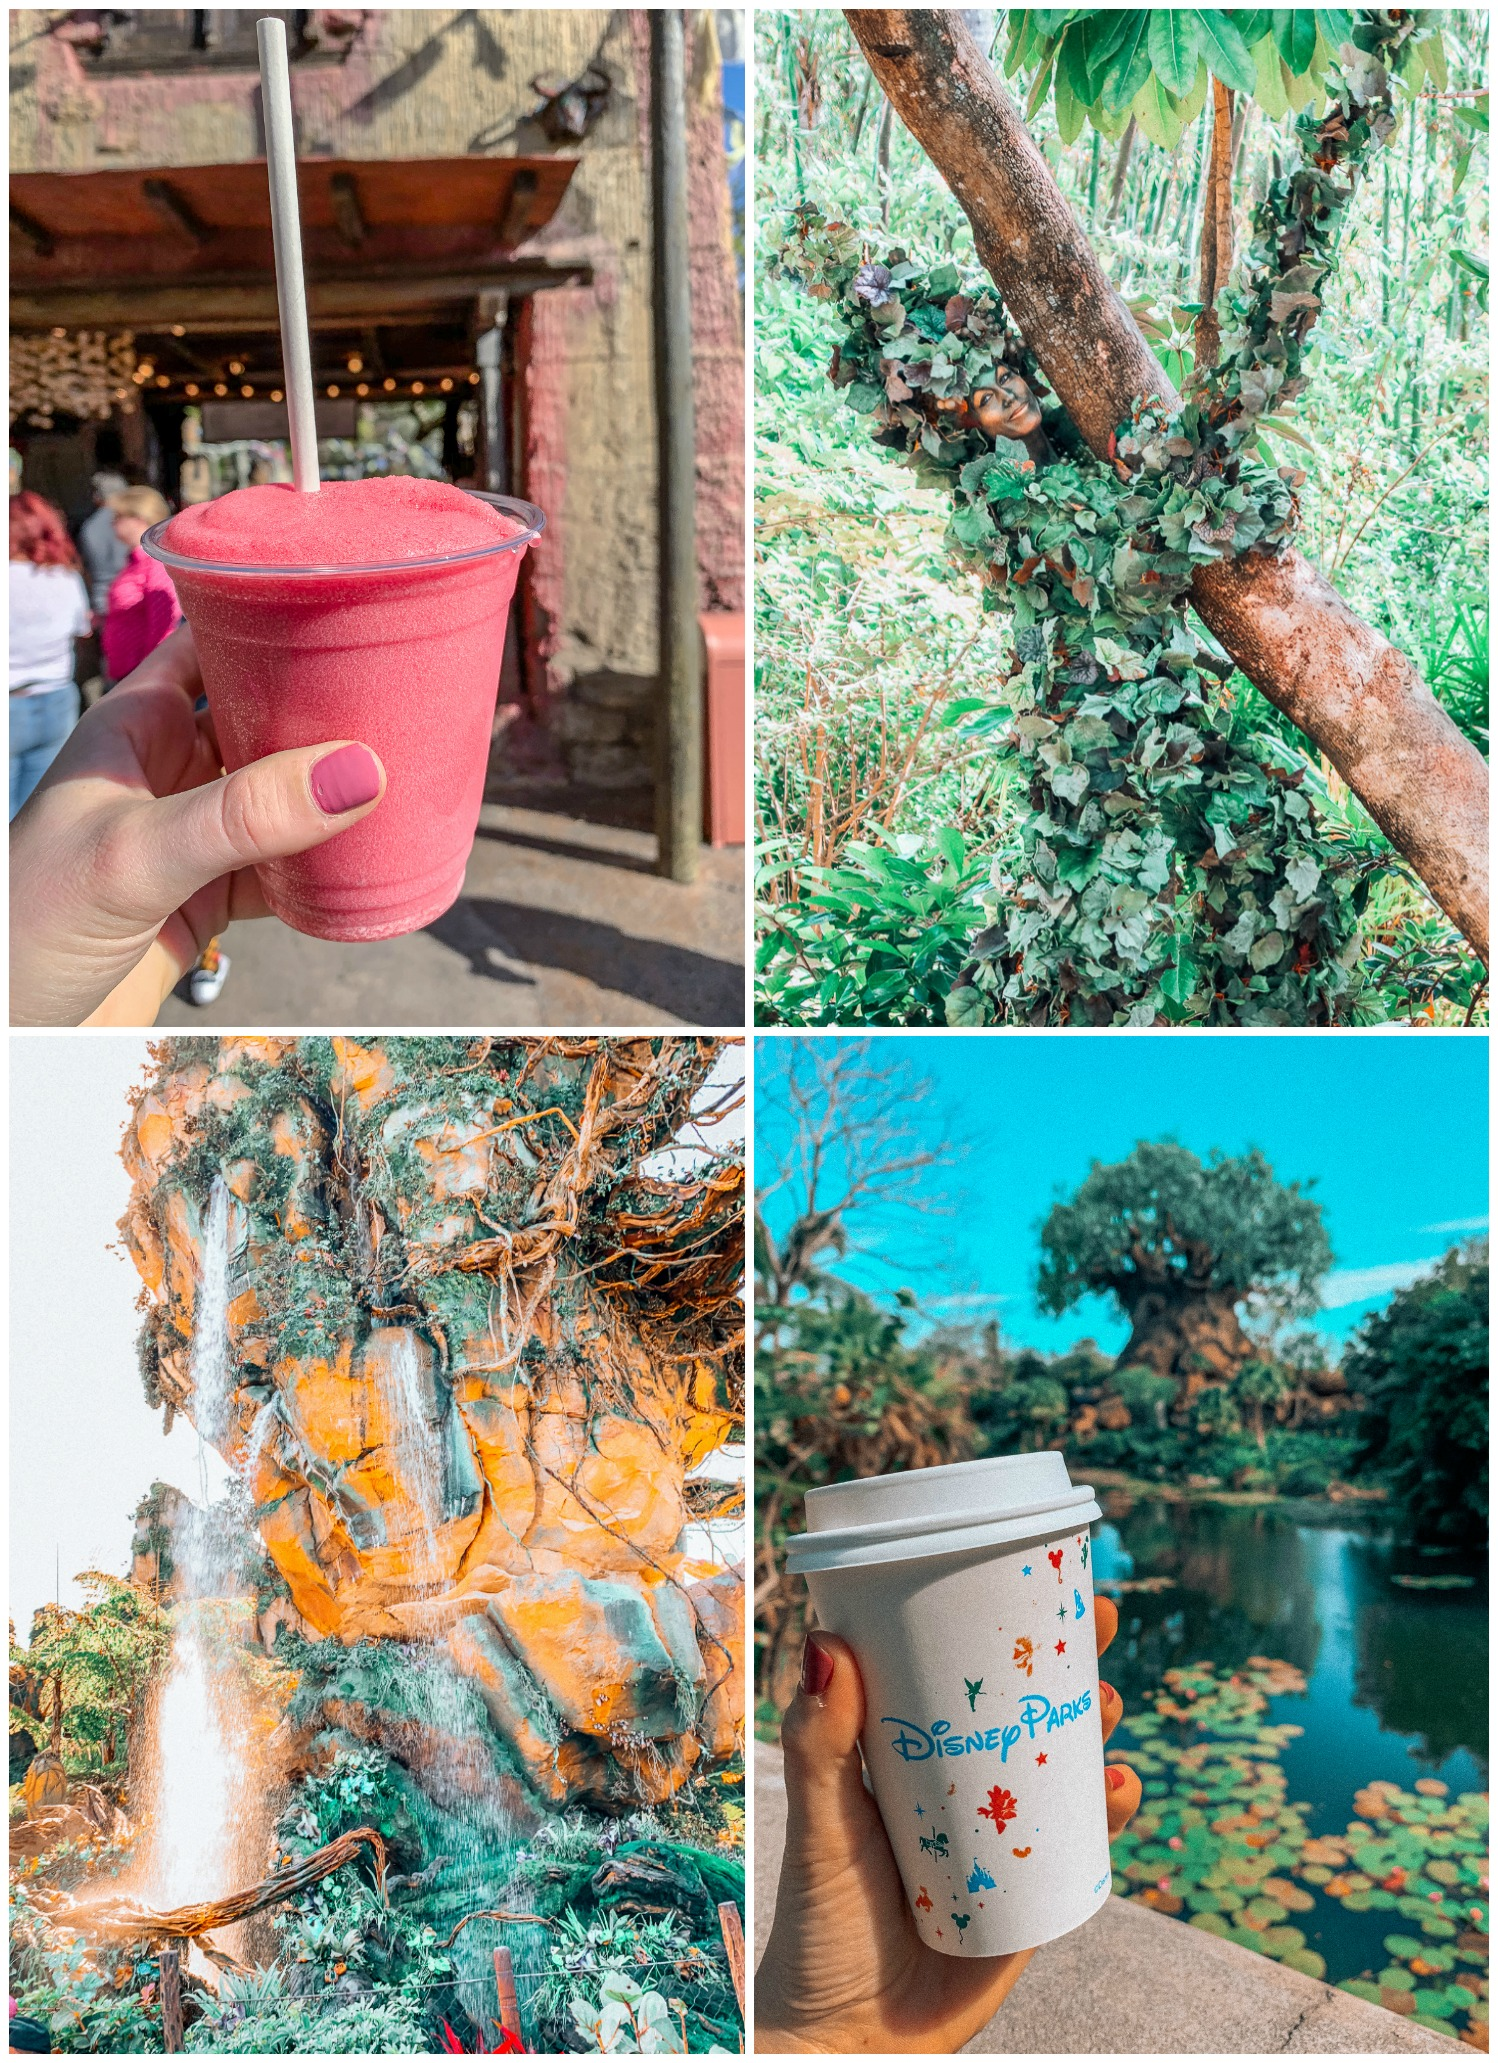 Itinerary Walt Disney World Animal Kingdom Nomad Lounge coffee mount Everest thirsty river